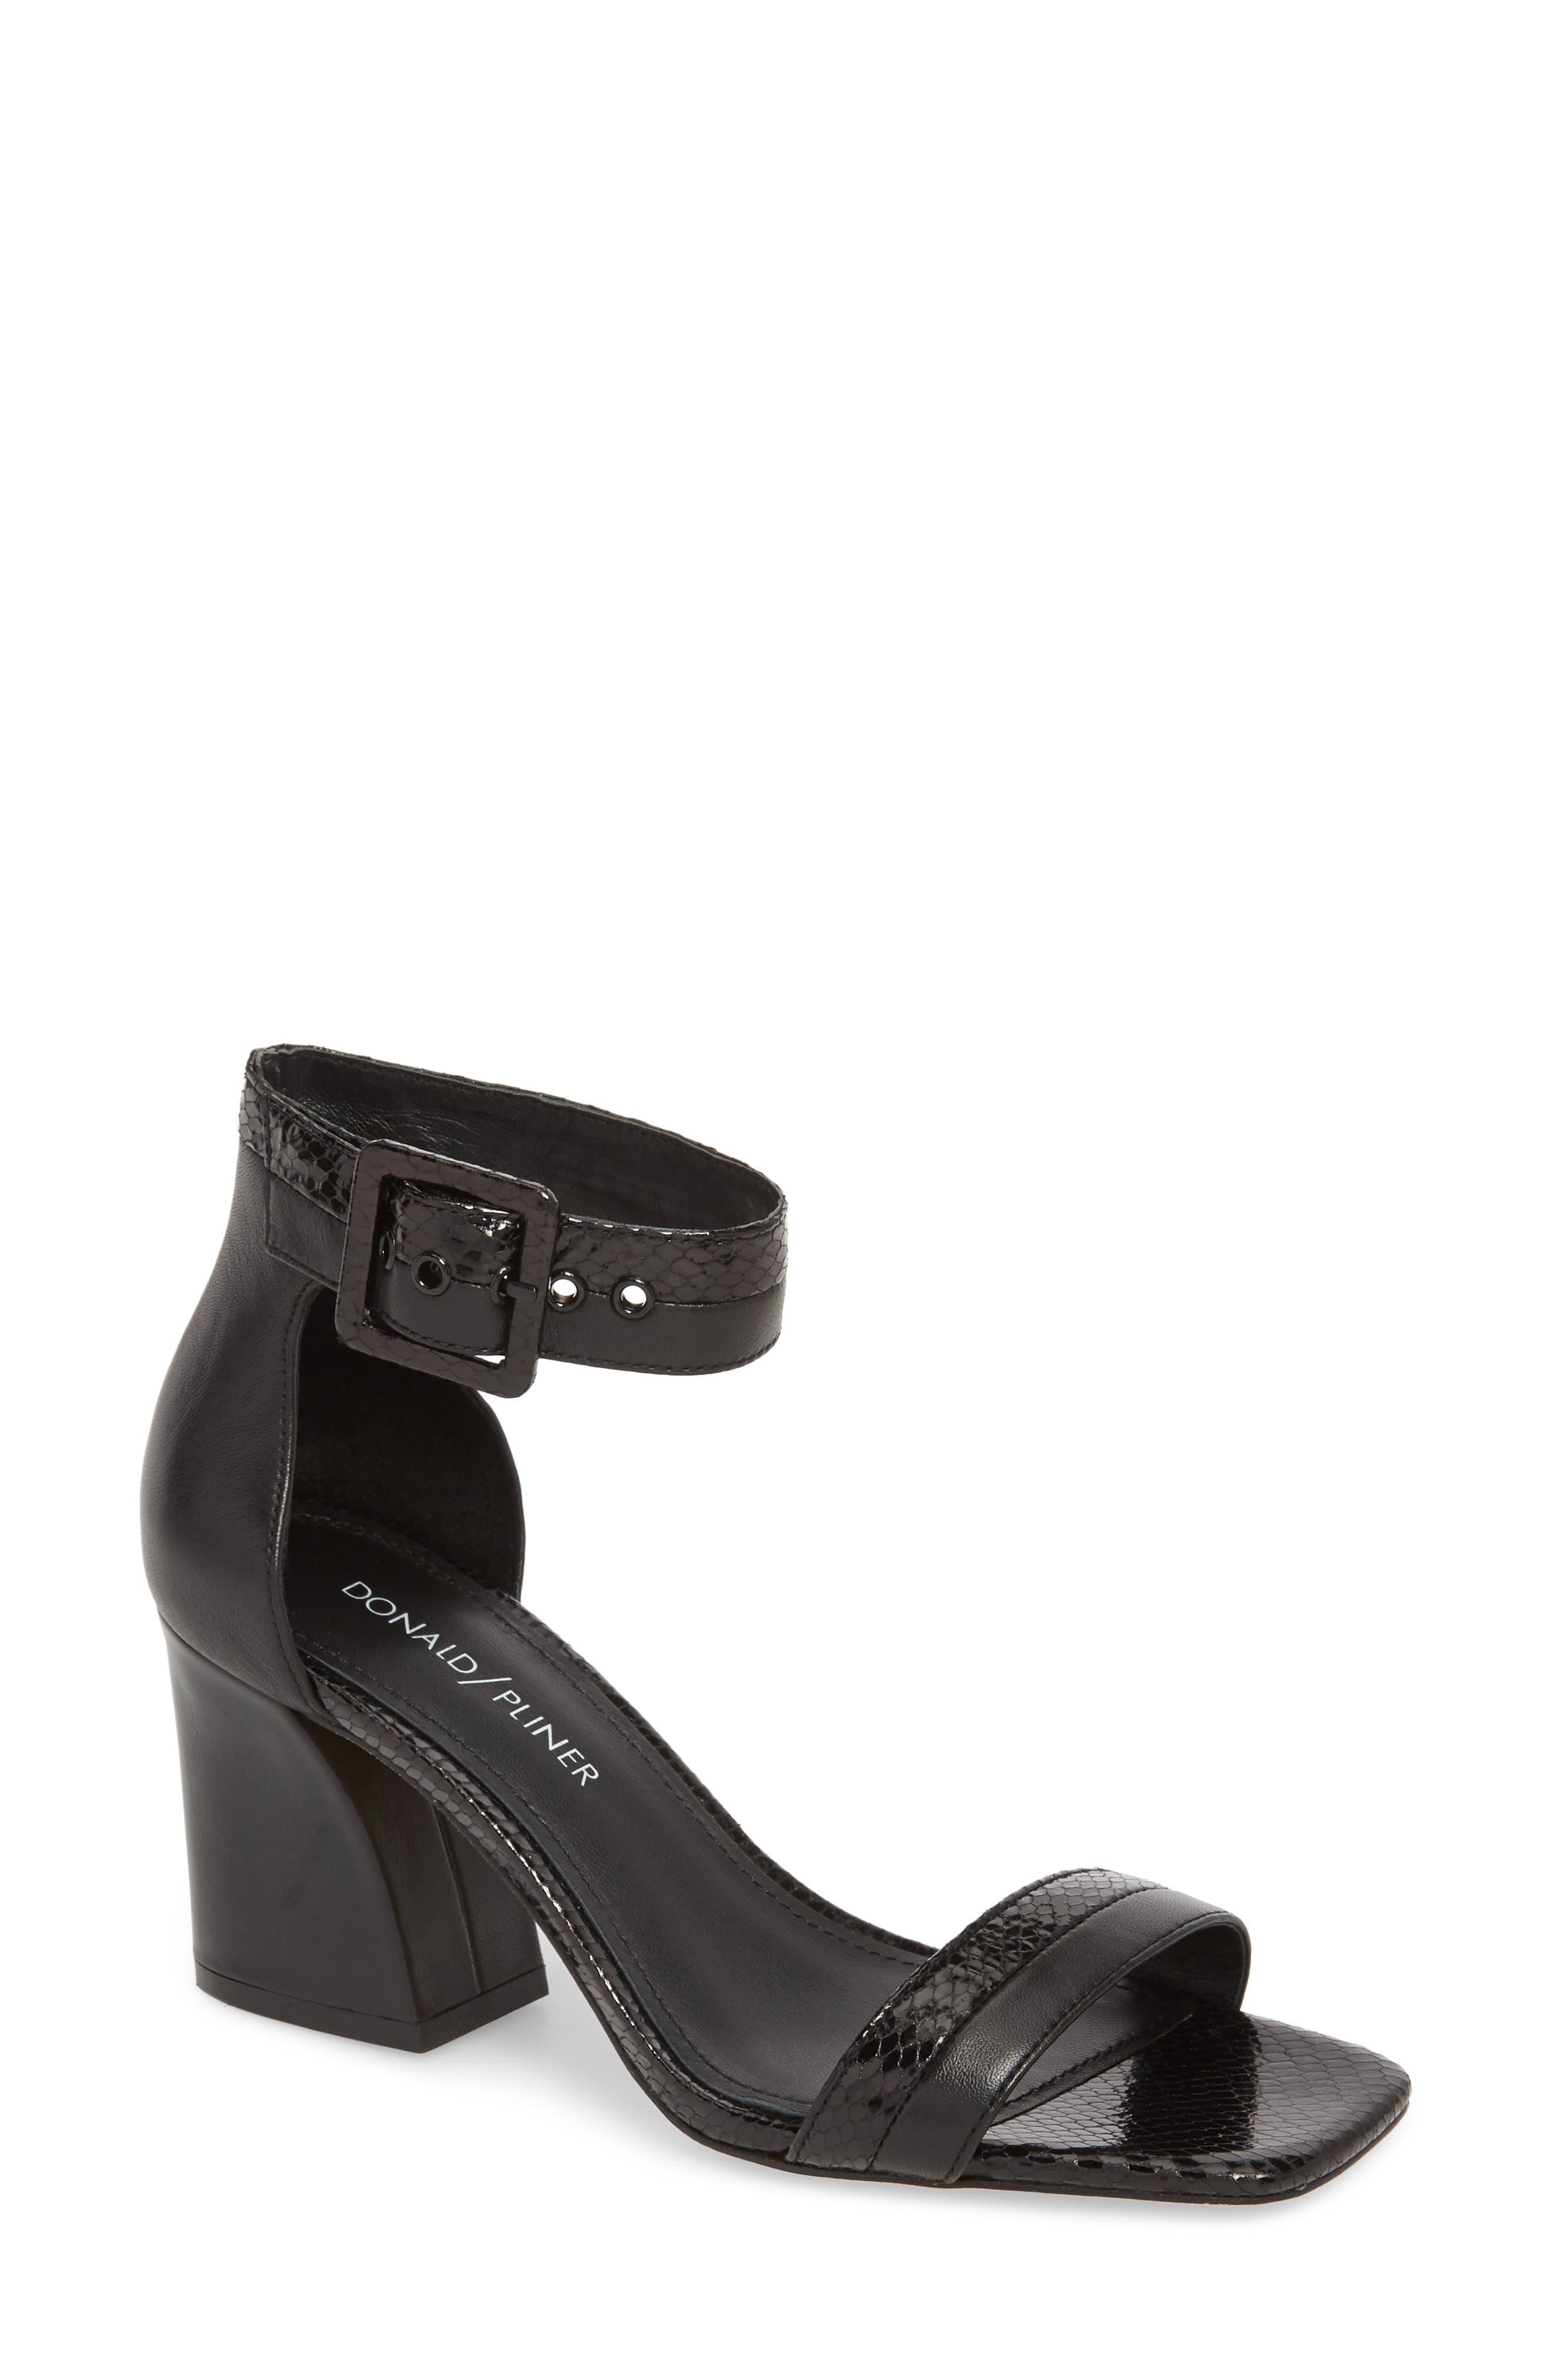 Watson Ankle Strap Sandal,                             Main thumbnail 1, color,                             BLACK PRINTED LEATHER